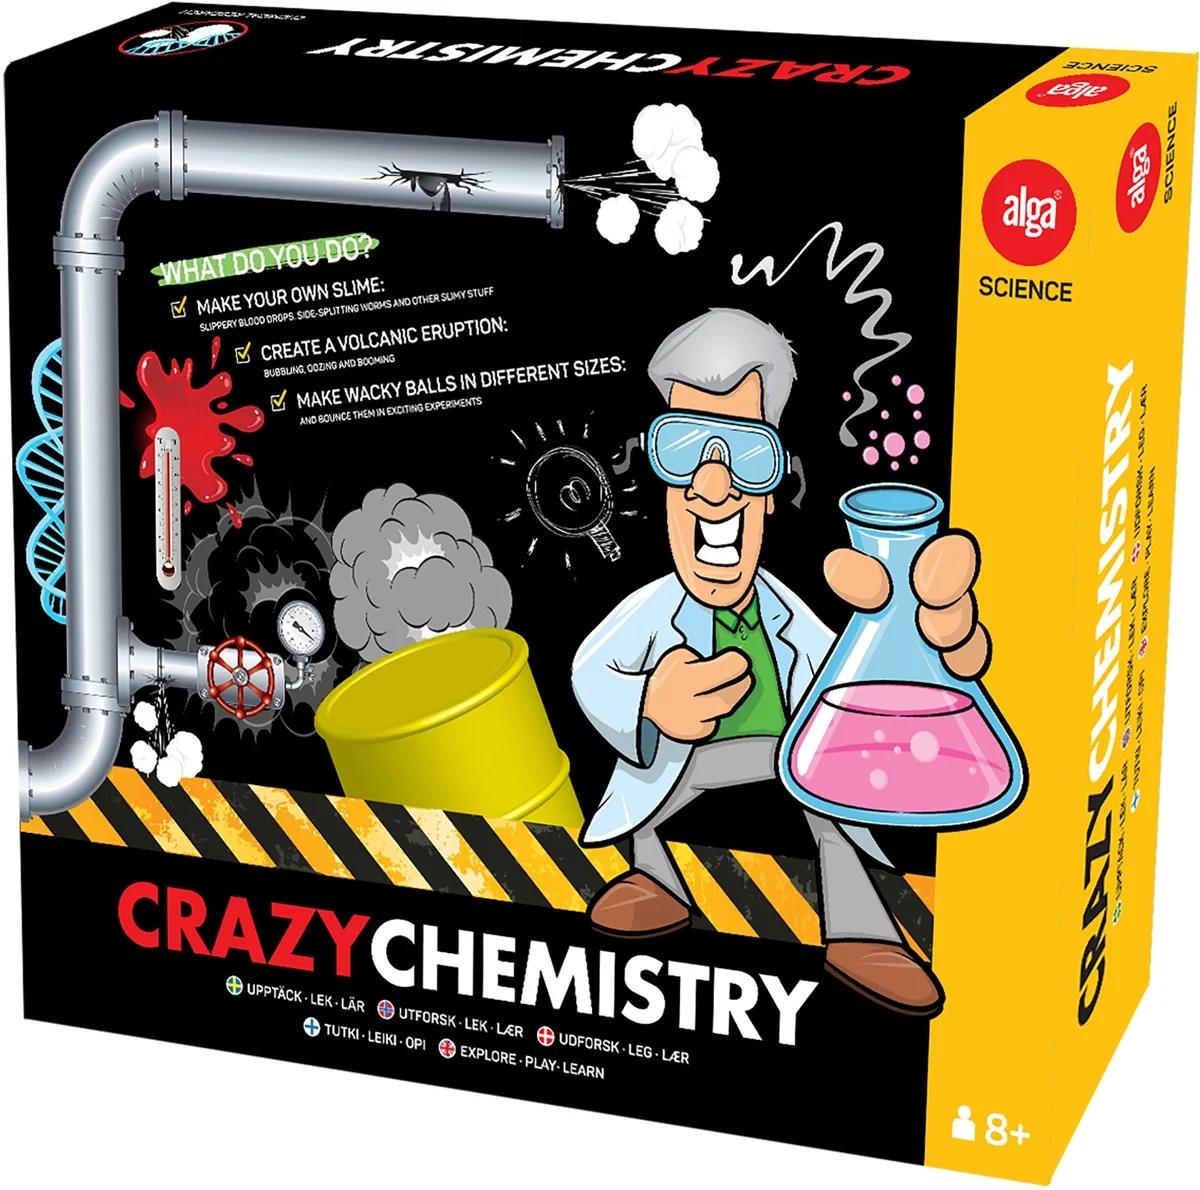 Bubblare 1: Alga Experiment Crazy Chemistry